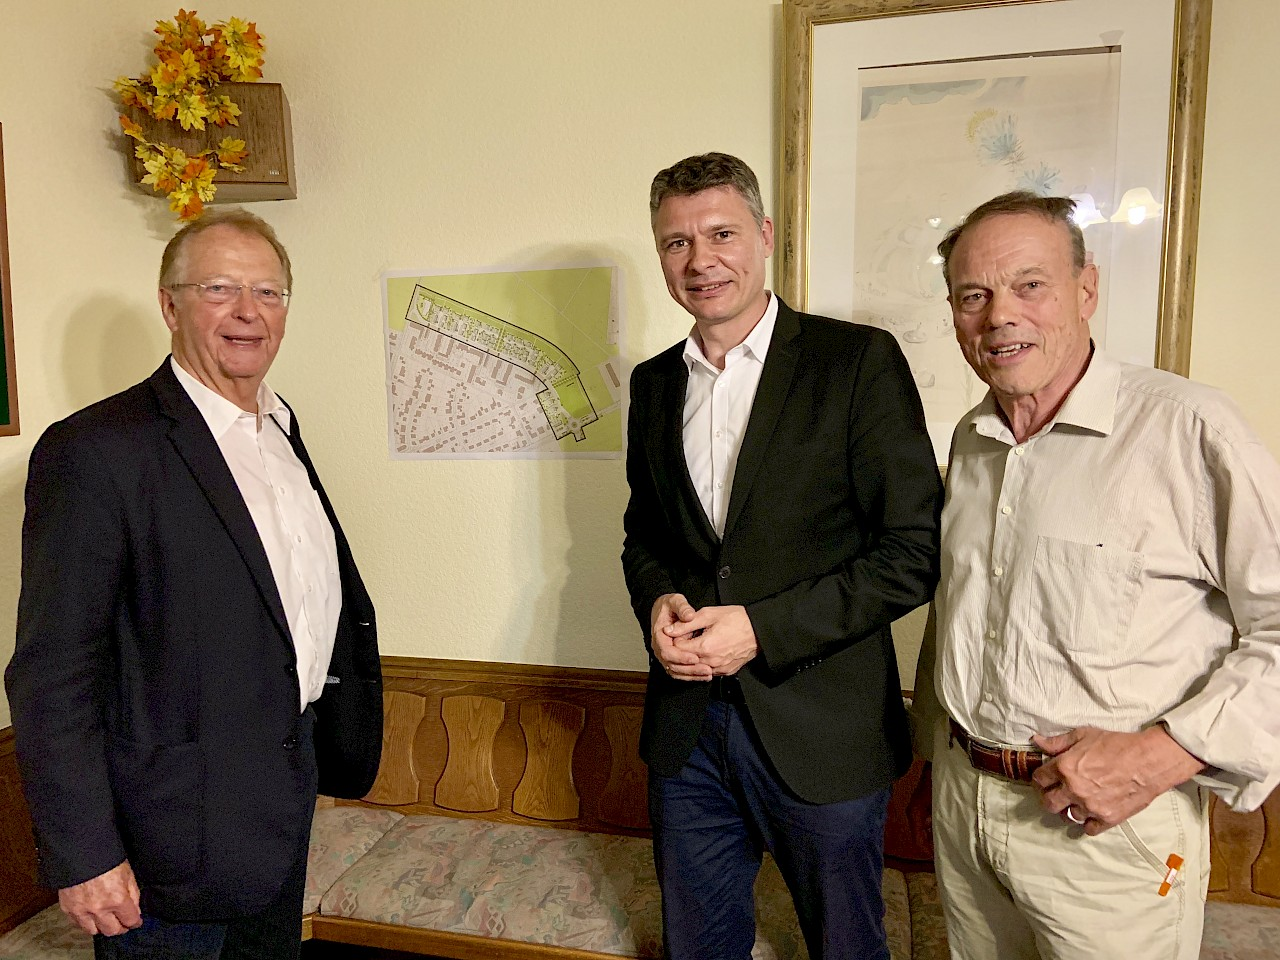 Stadtverordneter Karl Heinz Baum, Dr. Jörg Geerlings MdL und Kreistagsabgeordneter Volker Bäumken